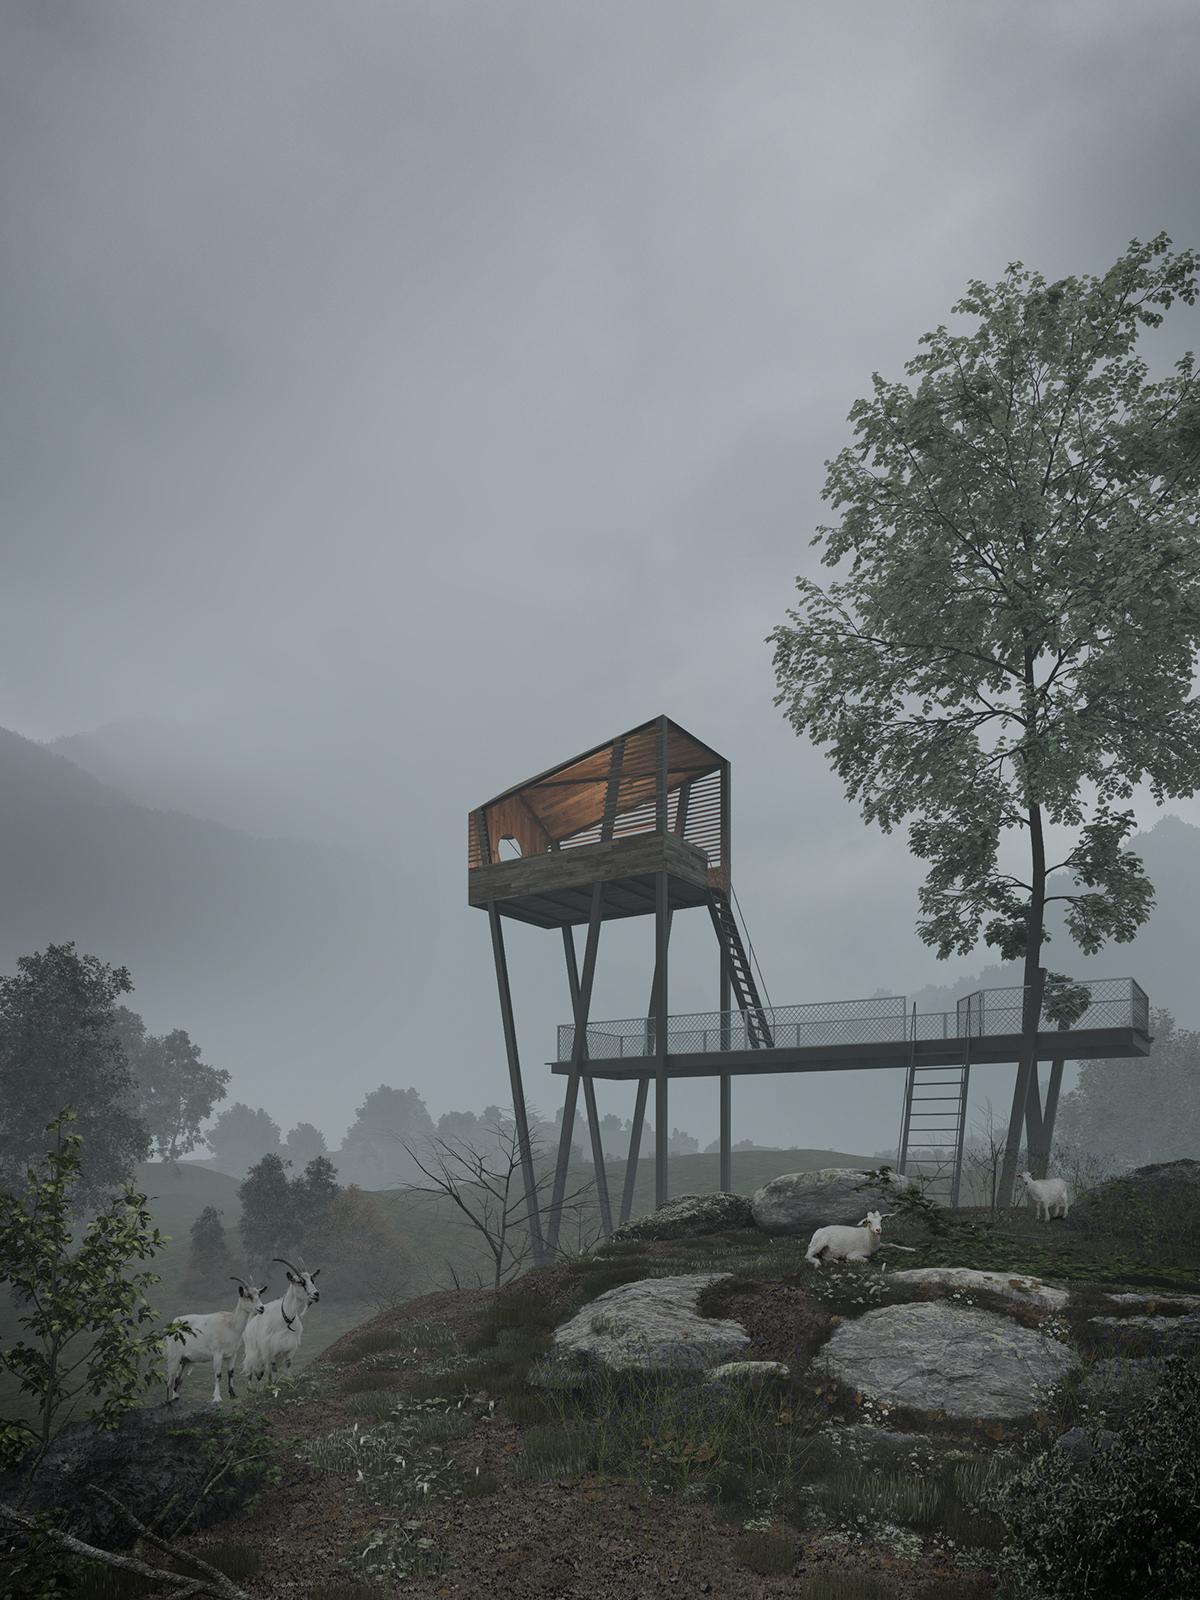 Tunglex Tung Le Xuan goat mountain Render 3dsmax natural fog log hut